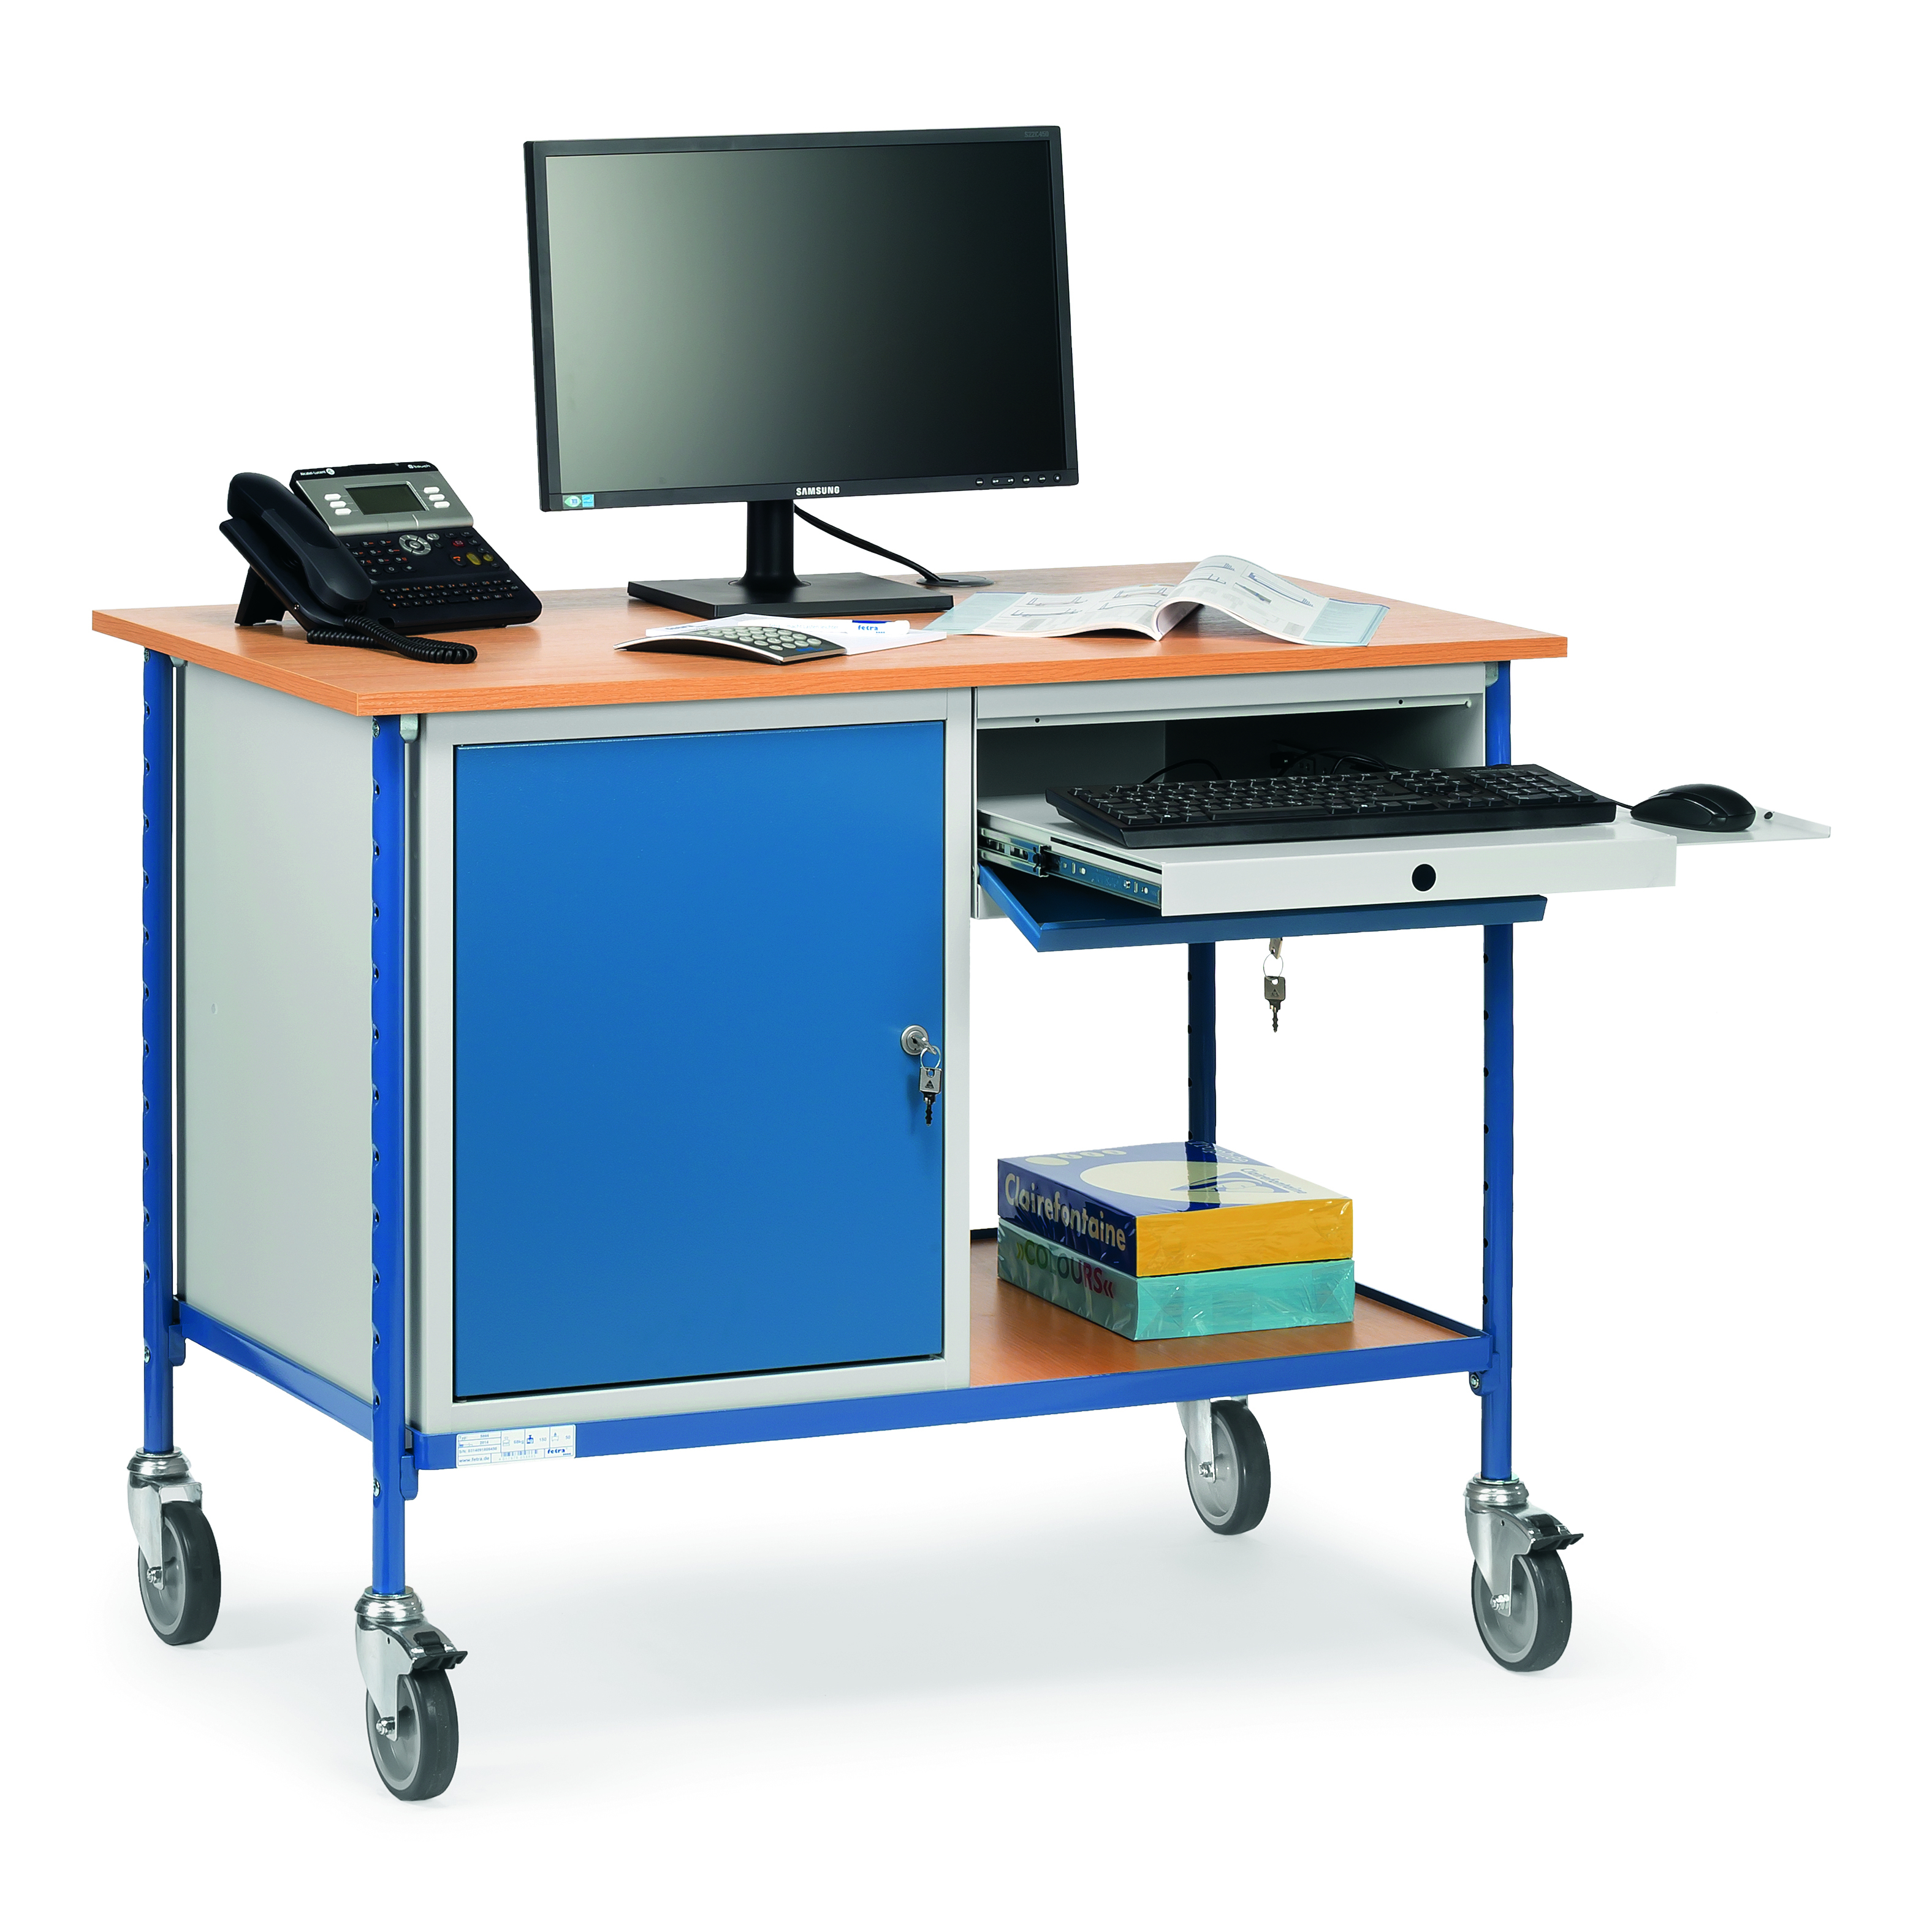 Table roulante Charge 7 kg - 7 tiroir - 7 placard